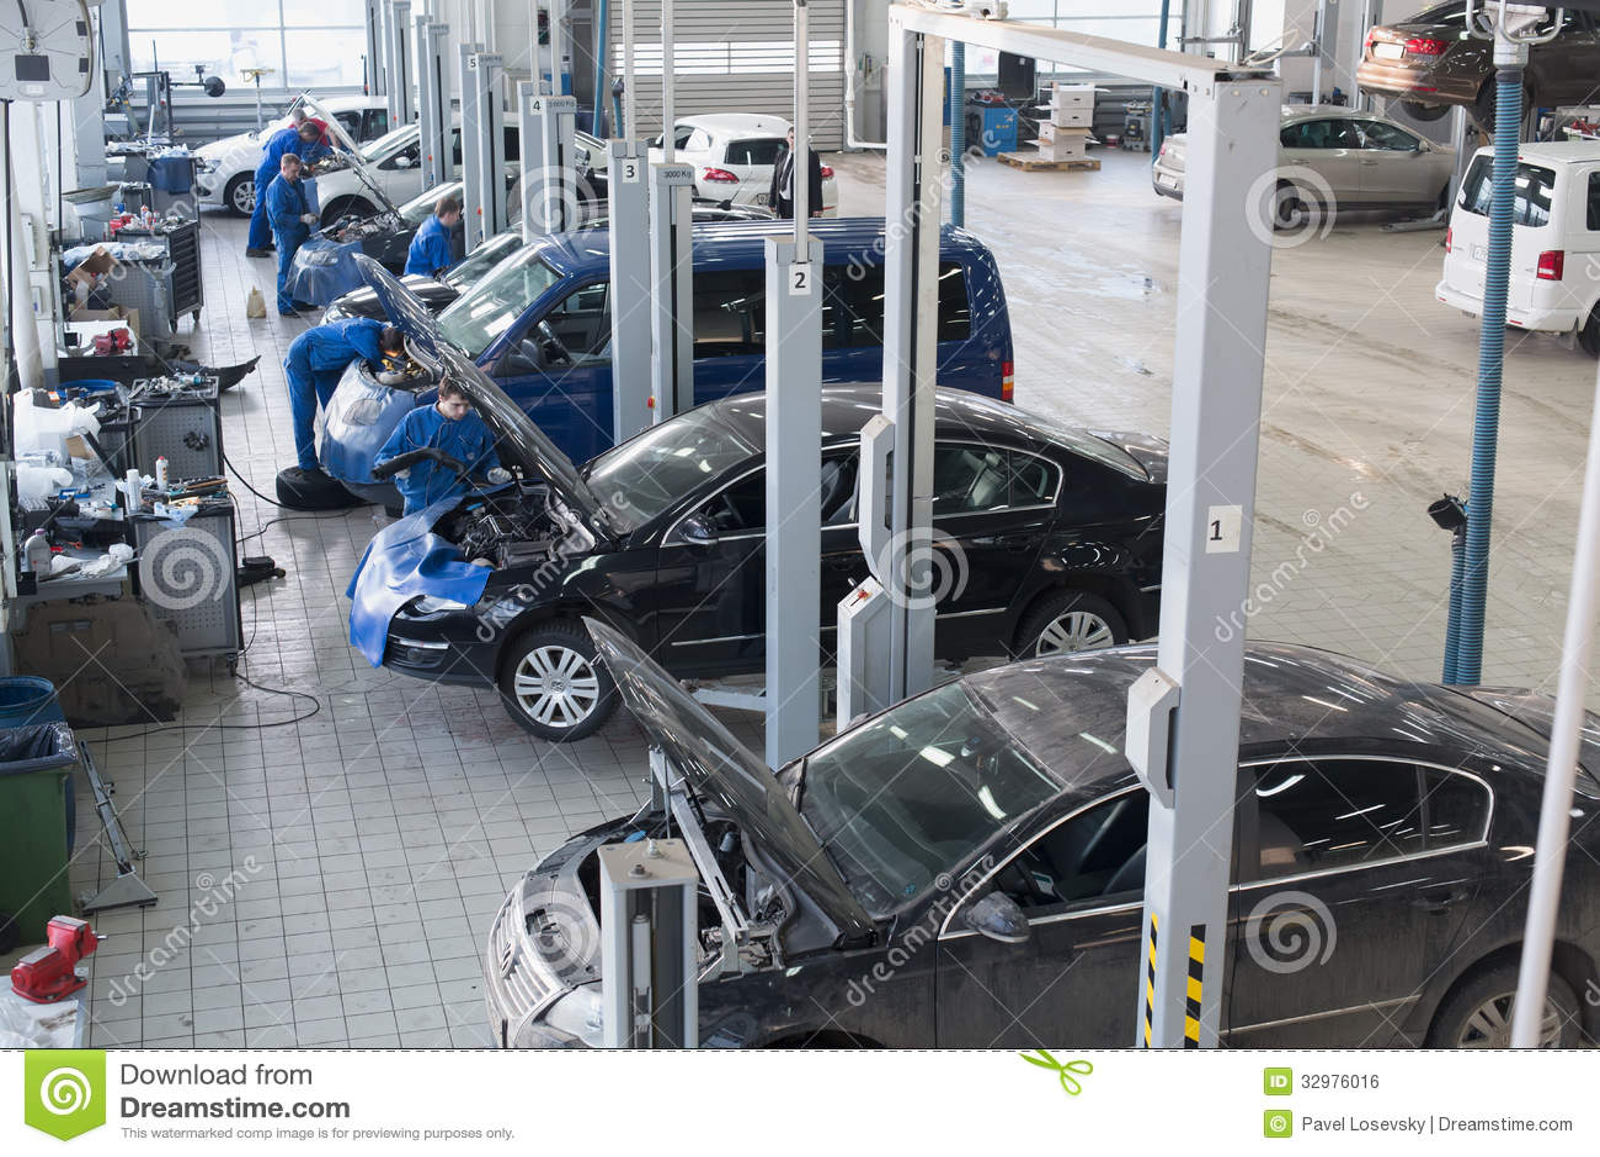 Design car repair workshop - Car Mechanical Varshavka Workshop Diagnostics Blue Safety Lift Mechanic